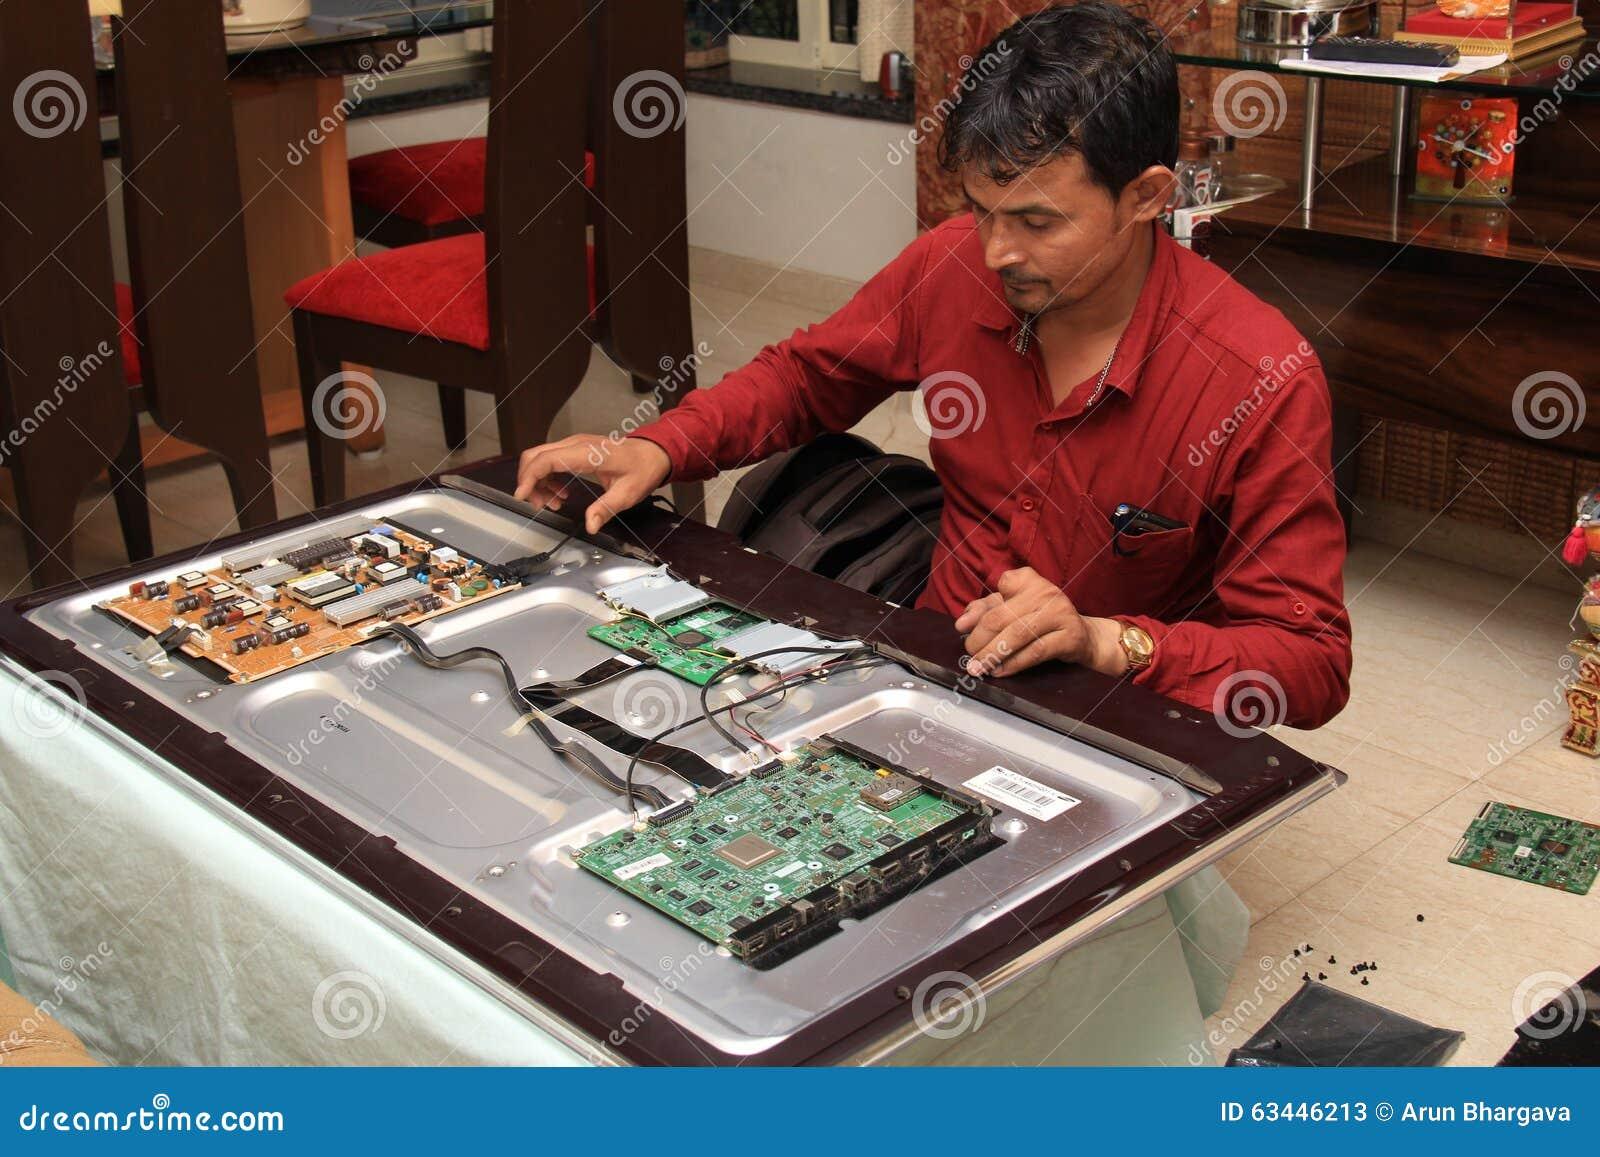 Repairing a television